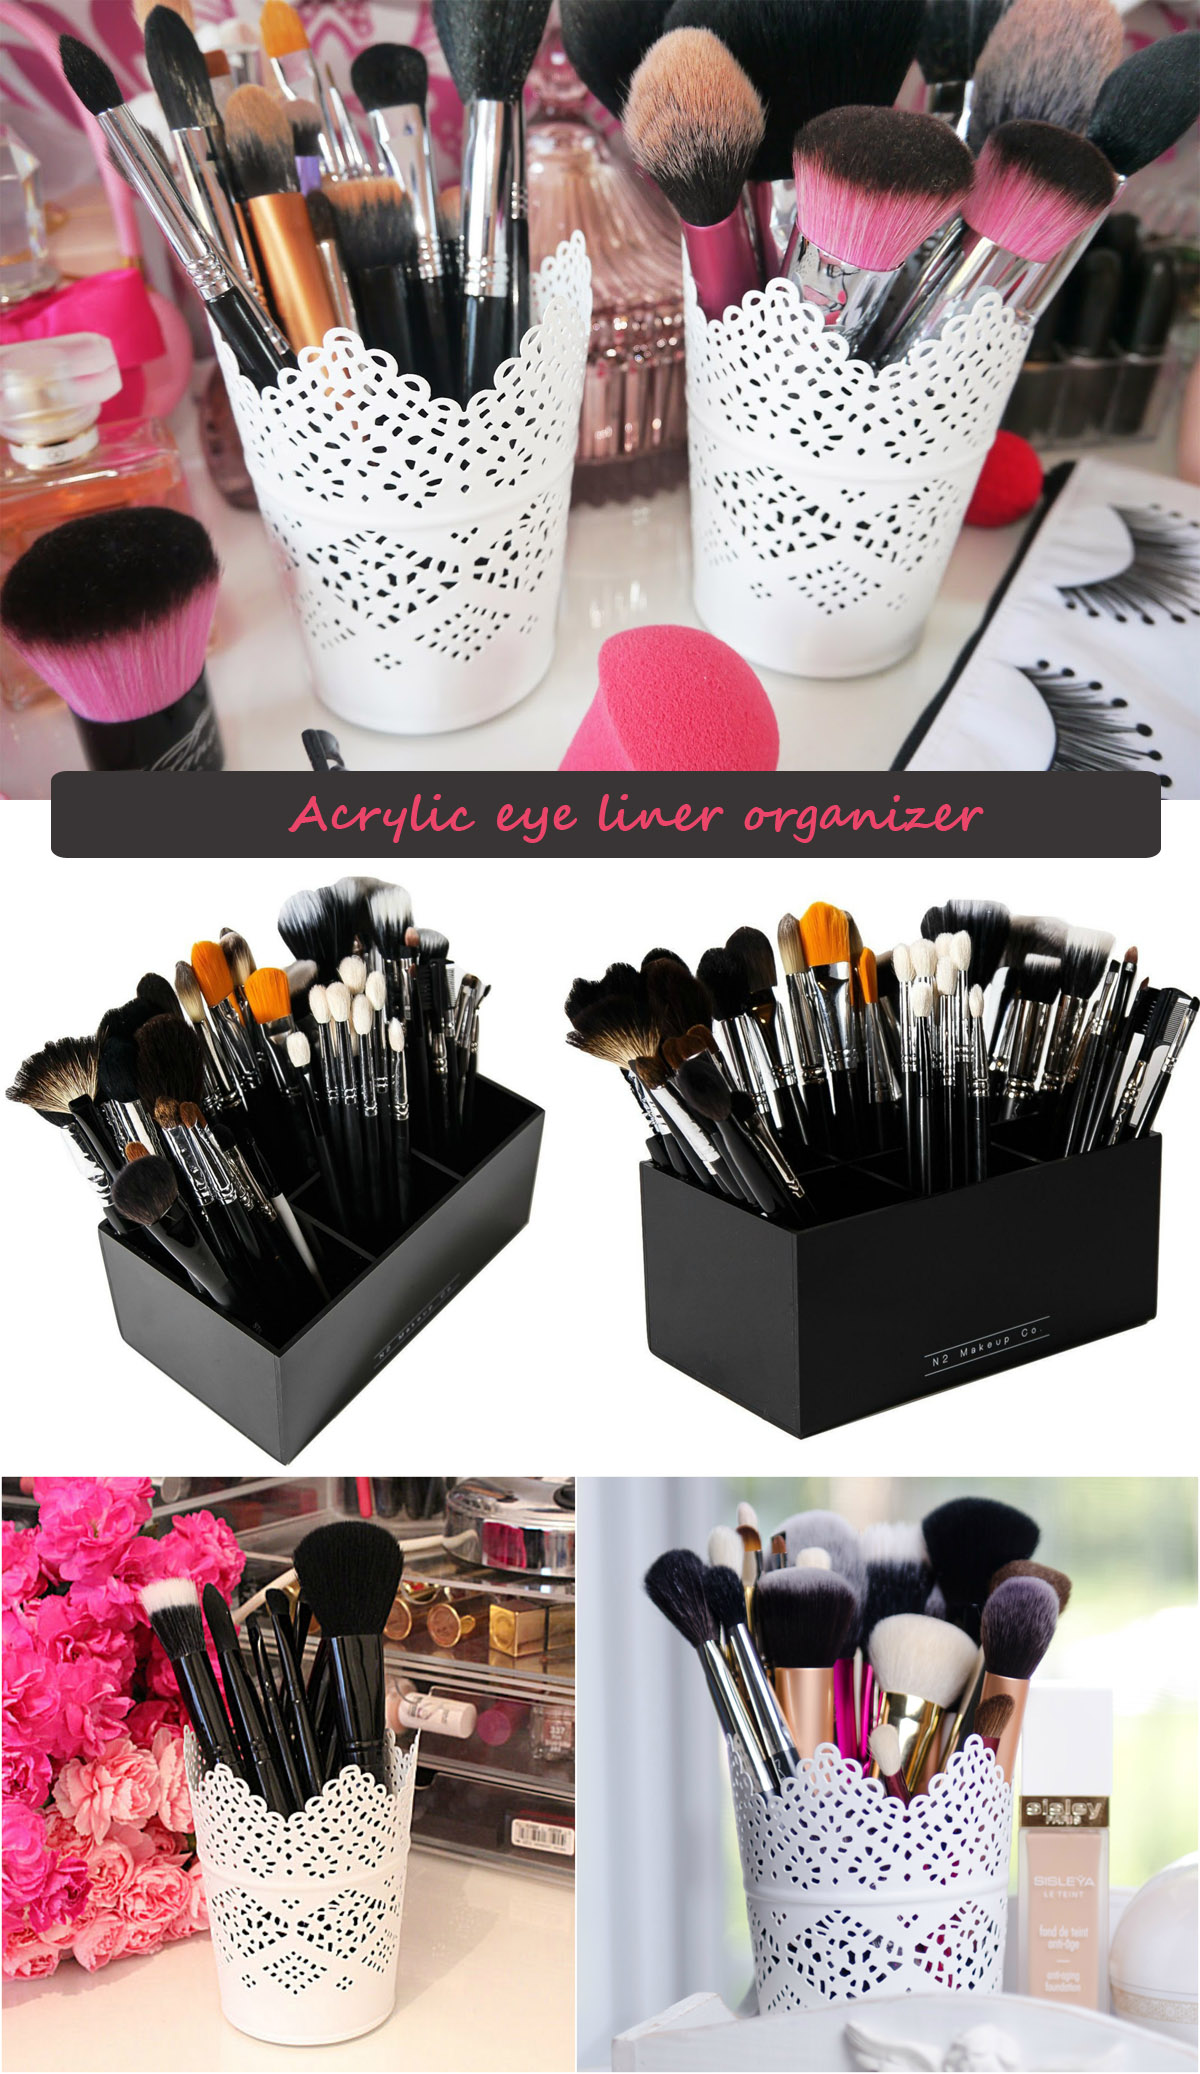 acrylic-eye-liner-organizer